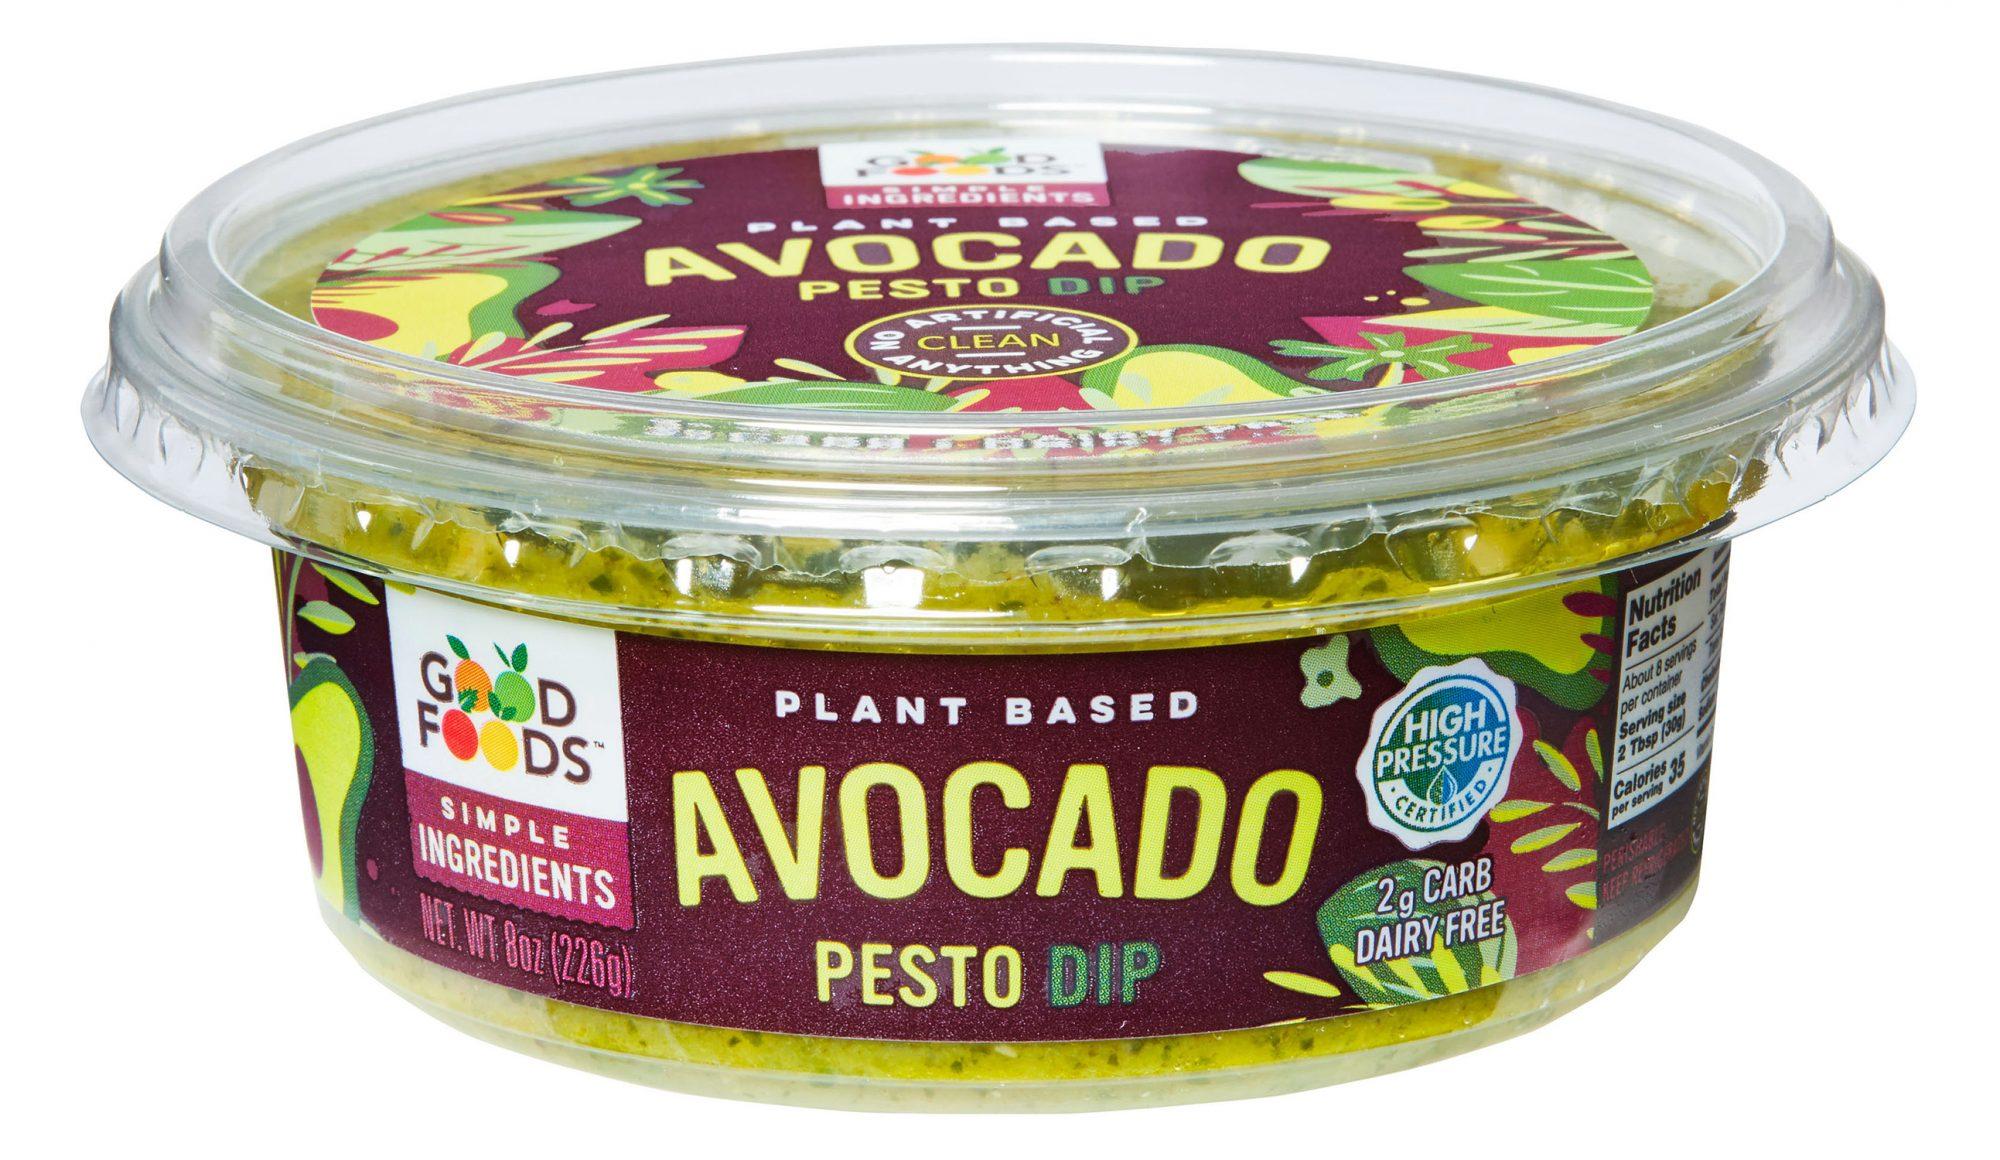 good foods planet based avocado pesto dip